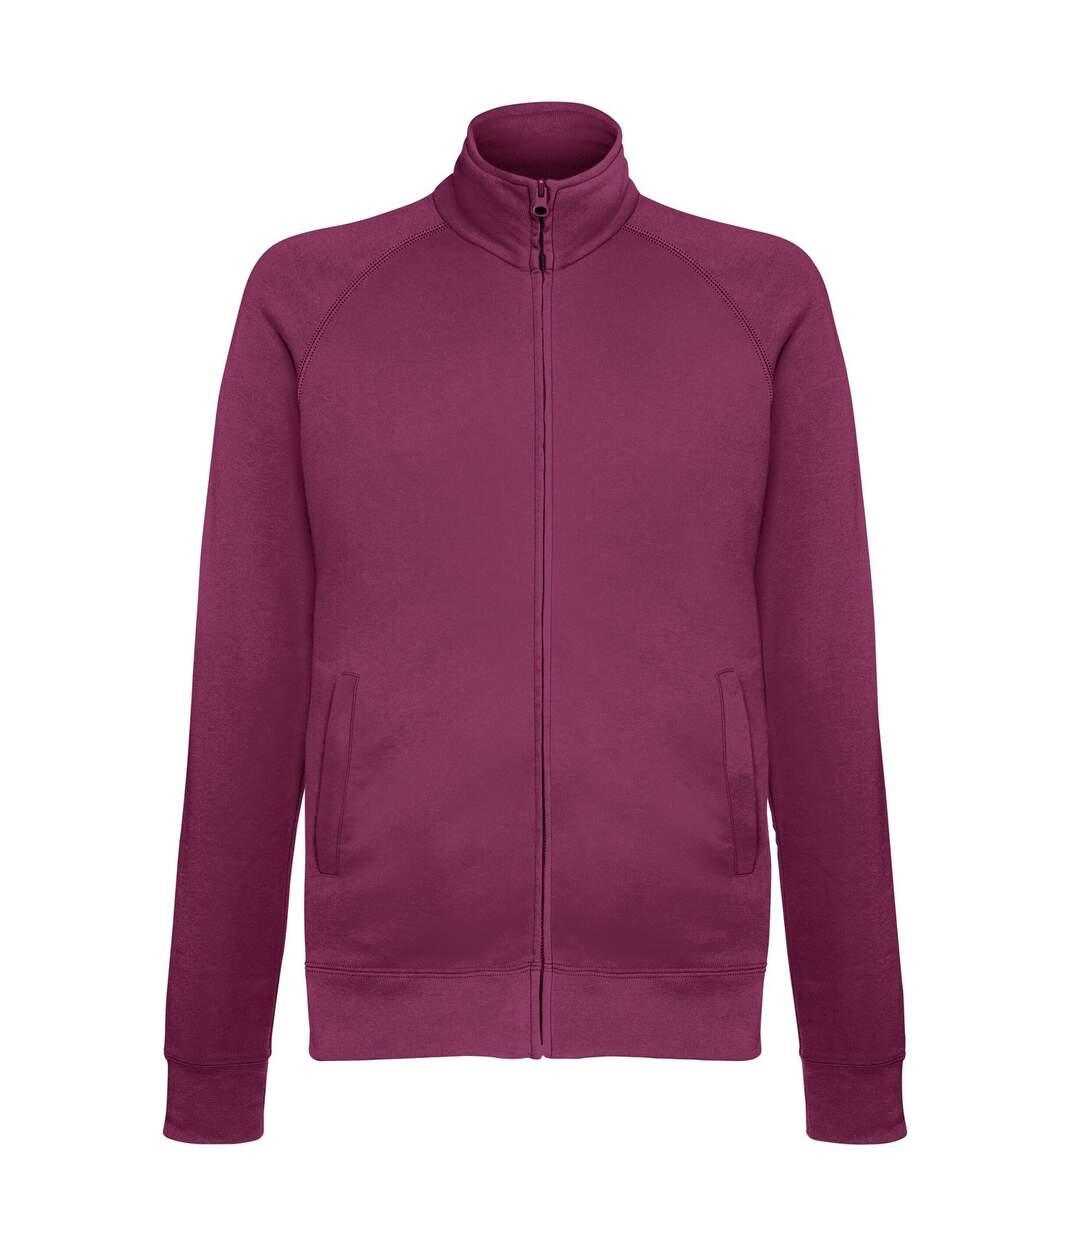 Fruit Of The Loom Mens Lightweight Full Zip Sweatshirt Jacket (Royal Blue) - UTRW4500